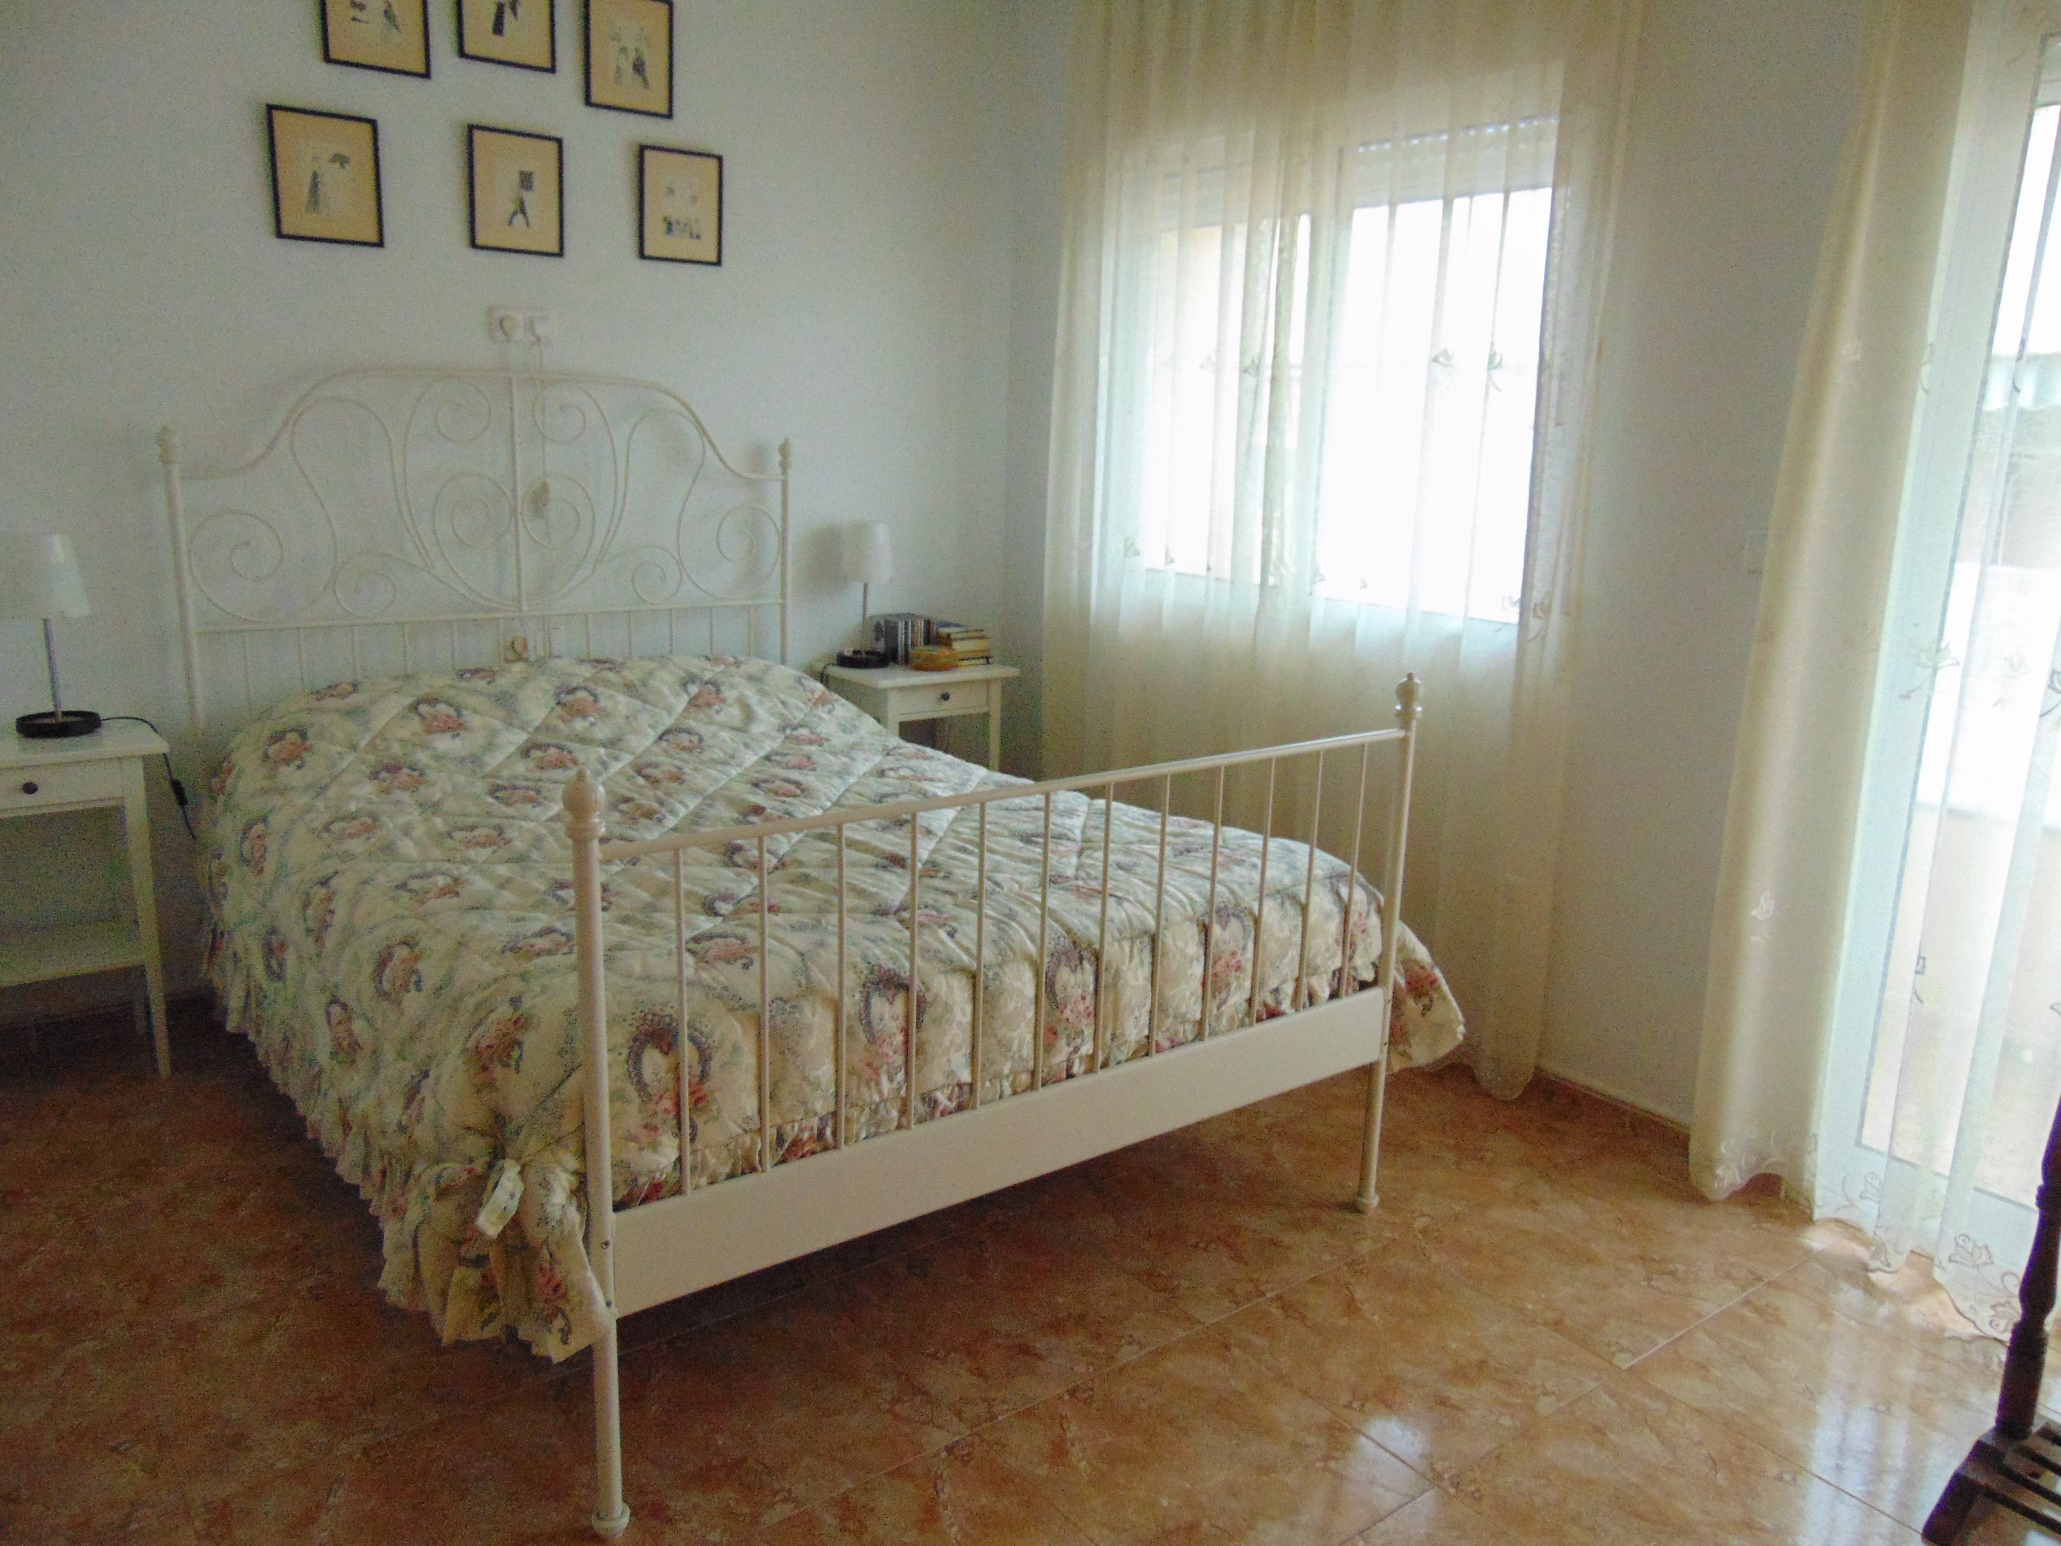 Propery For Sale in San Pedro del Pinatar, Spain image 8